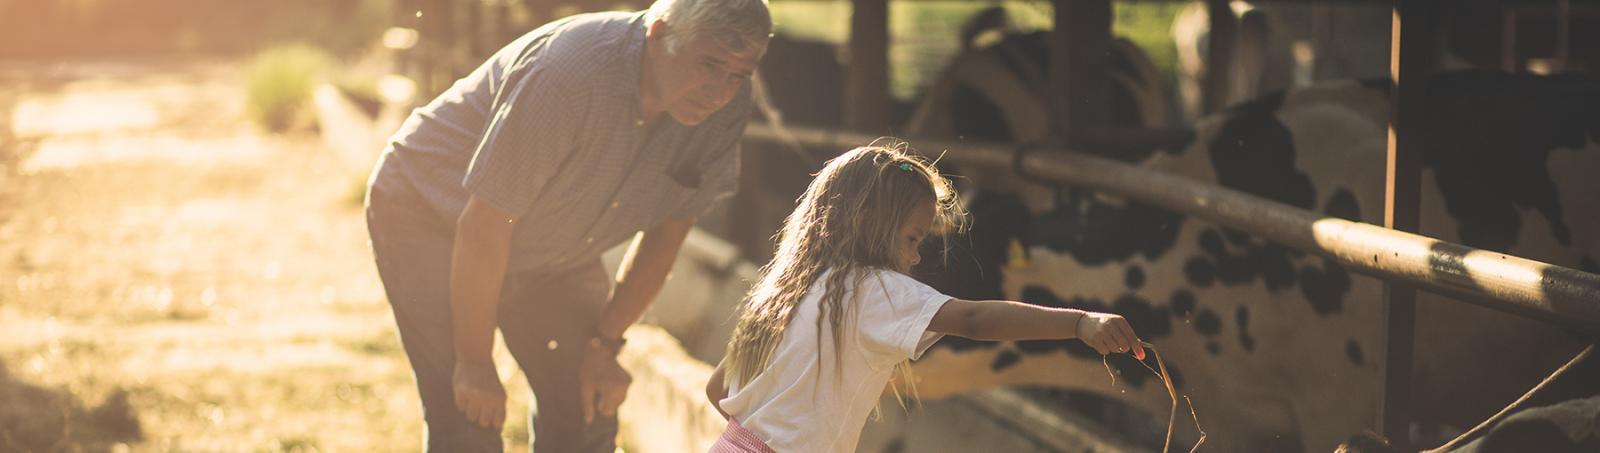 Young girl feeding livestock